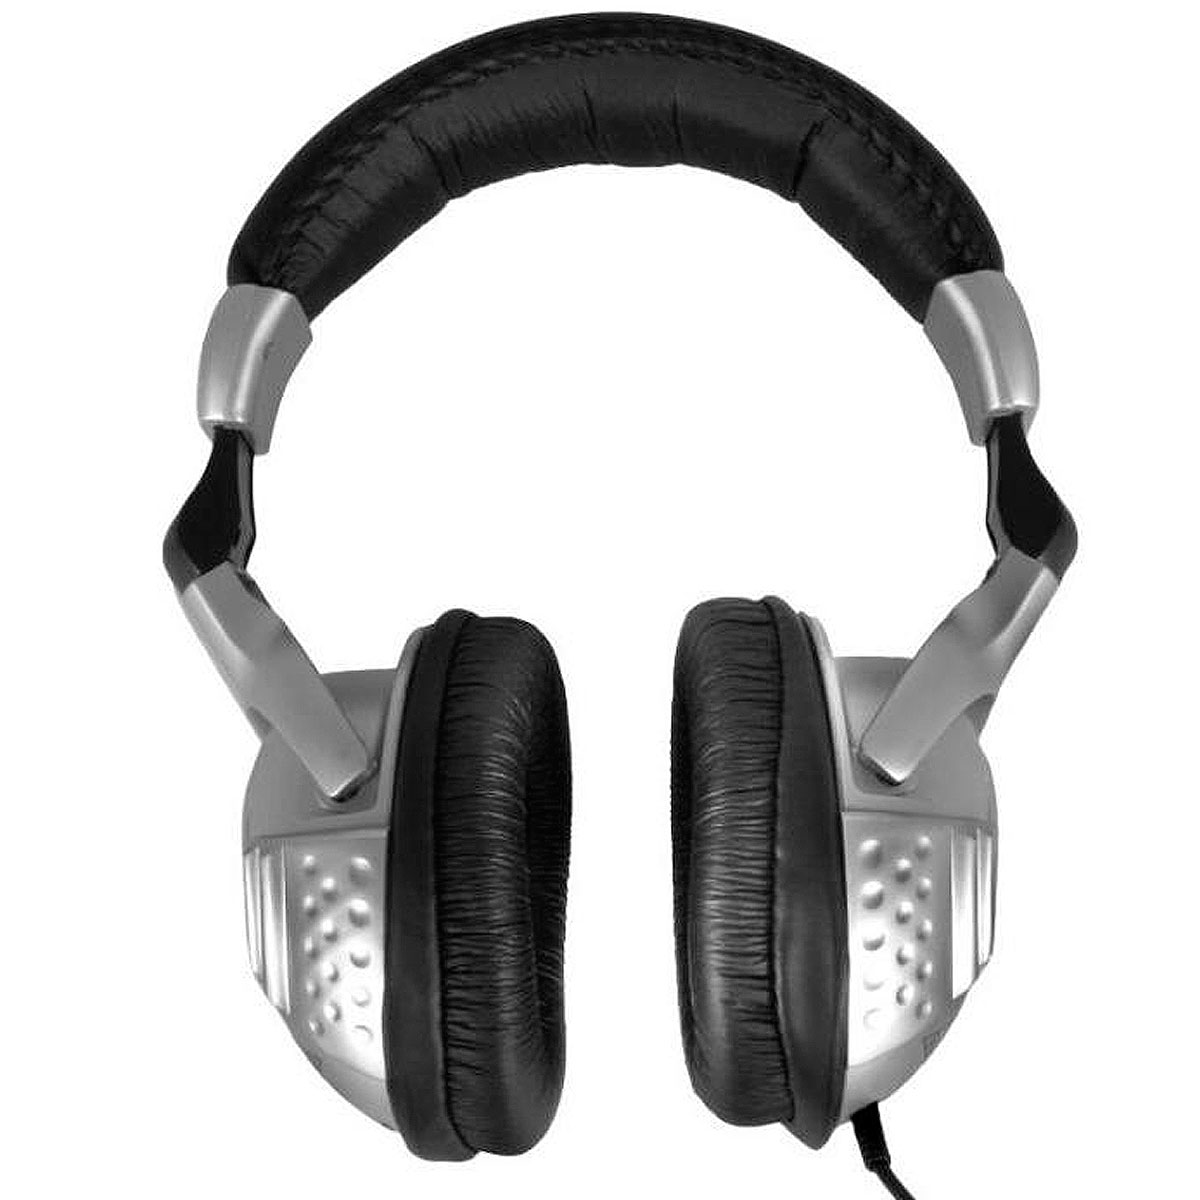 Fone de Ouvido Over-ear 20Hz - 20KHz 64 Ohms - HPS 3000 Behringer